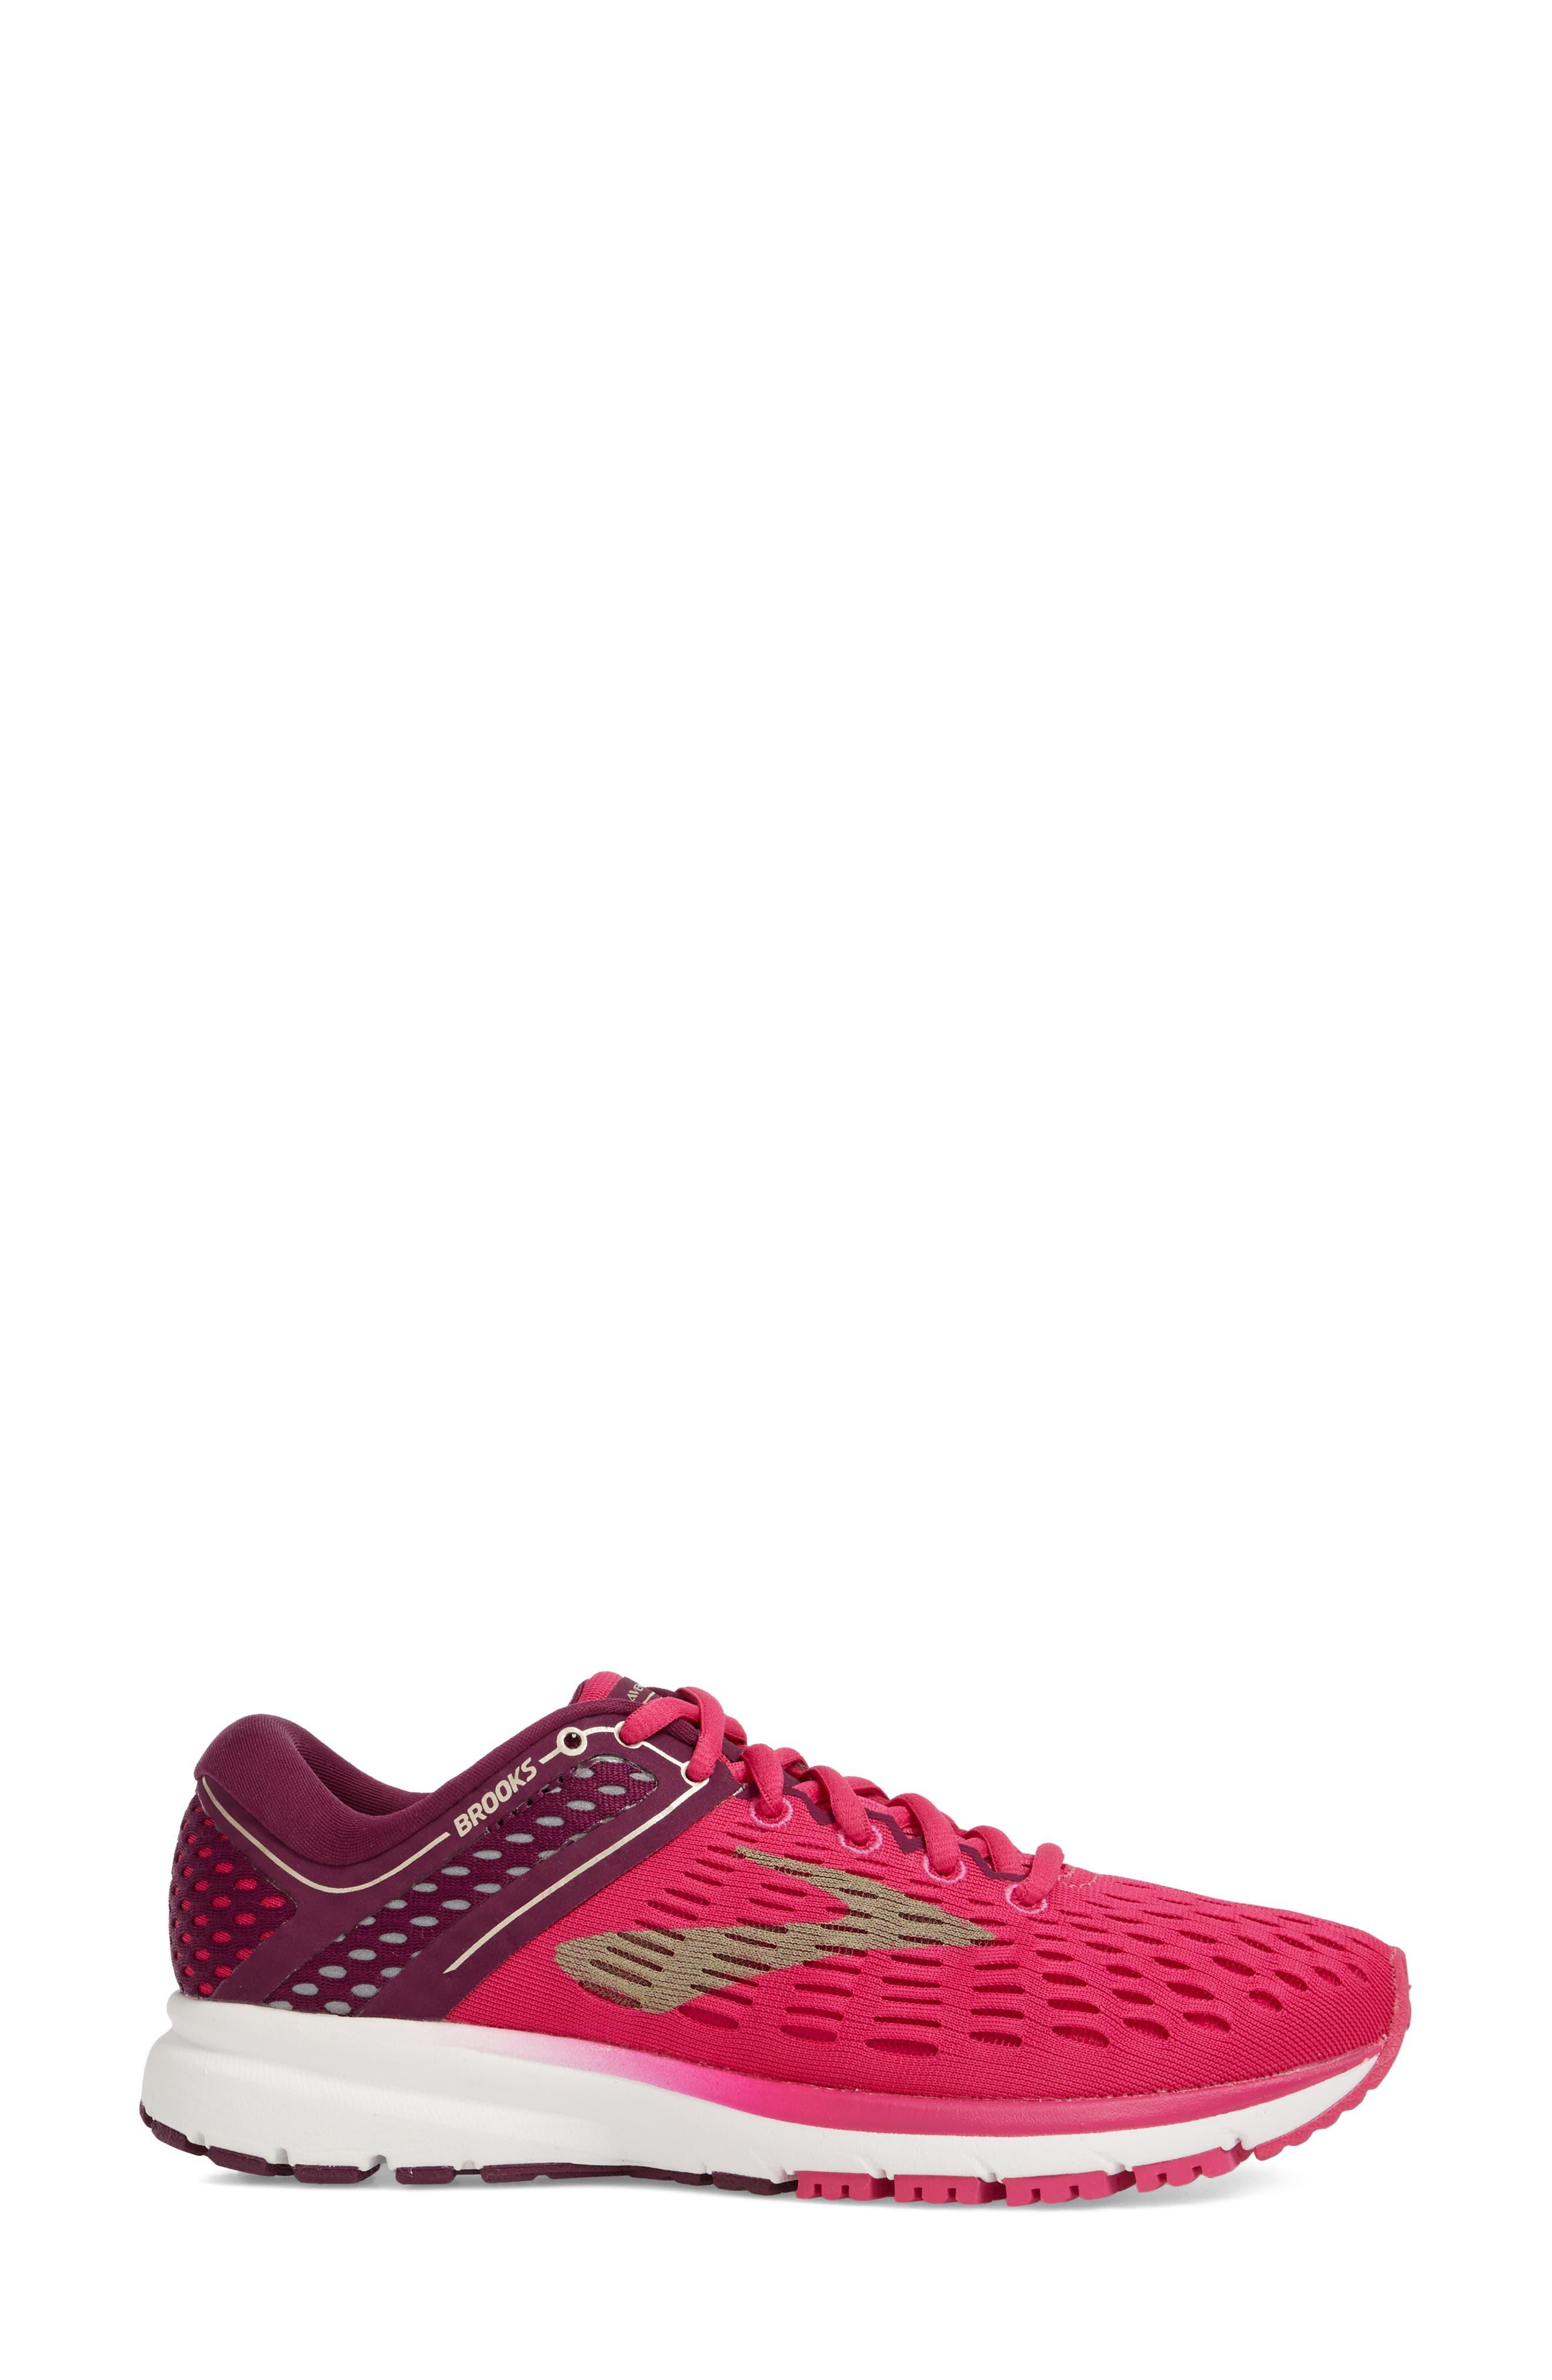 Ravenna 9 Running Shoe,                             Alternate thumbnail 3, color,                             Pink/ Plum/ Champagne